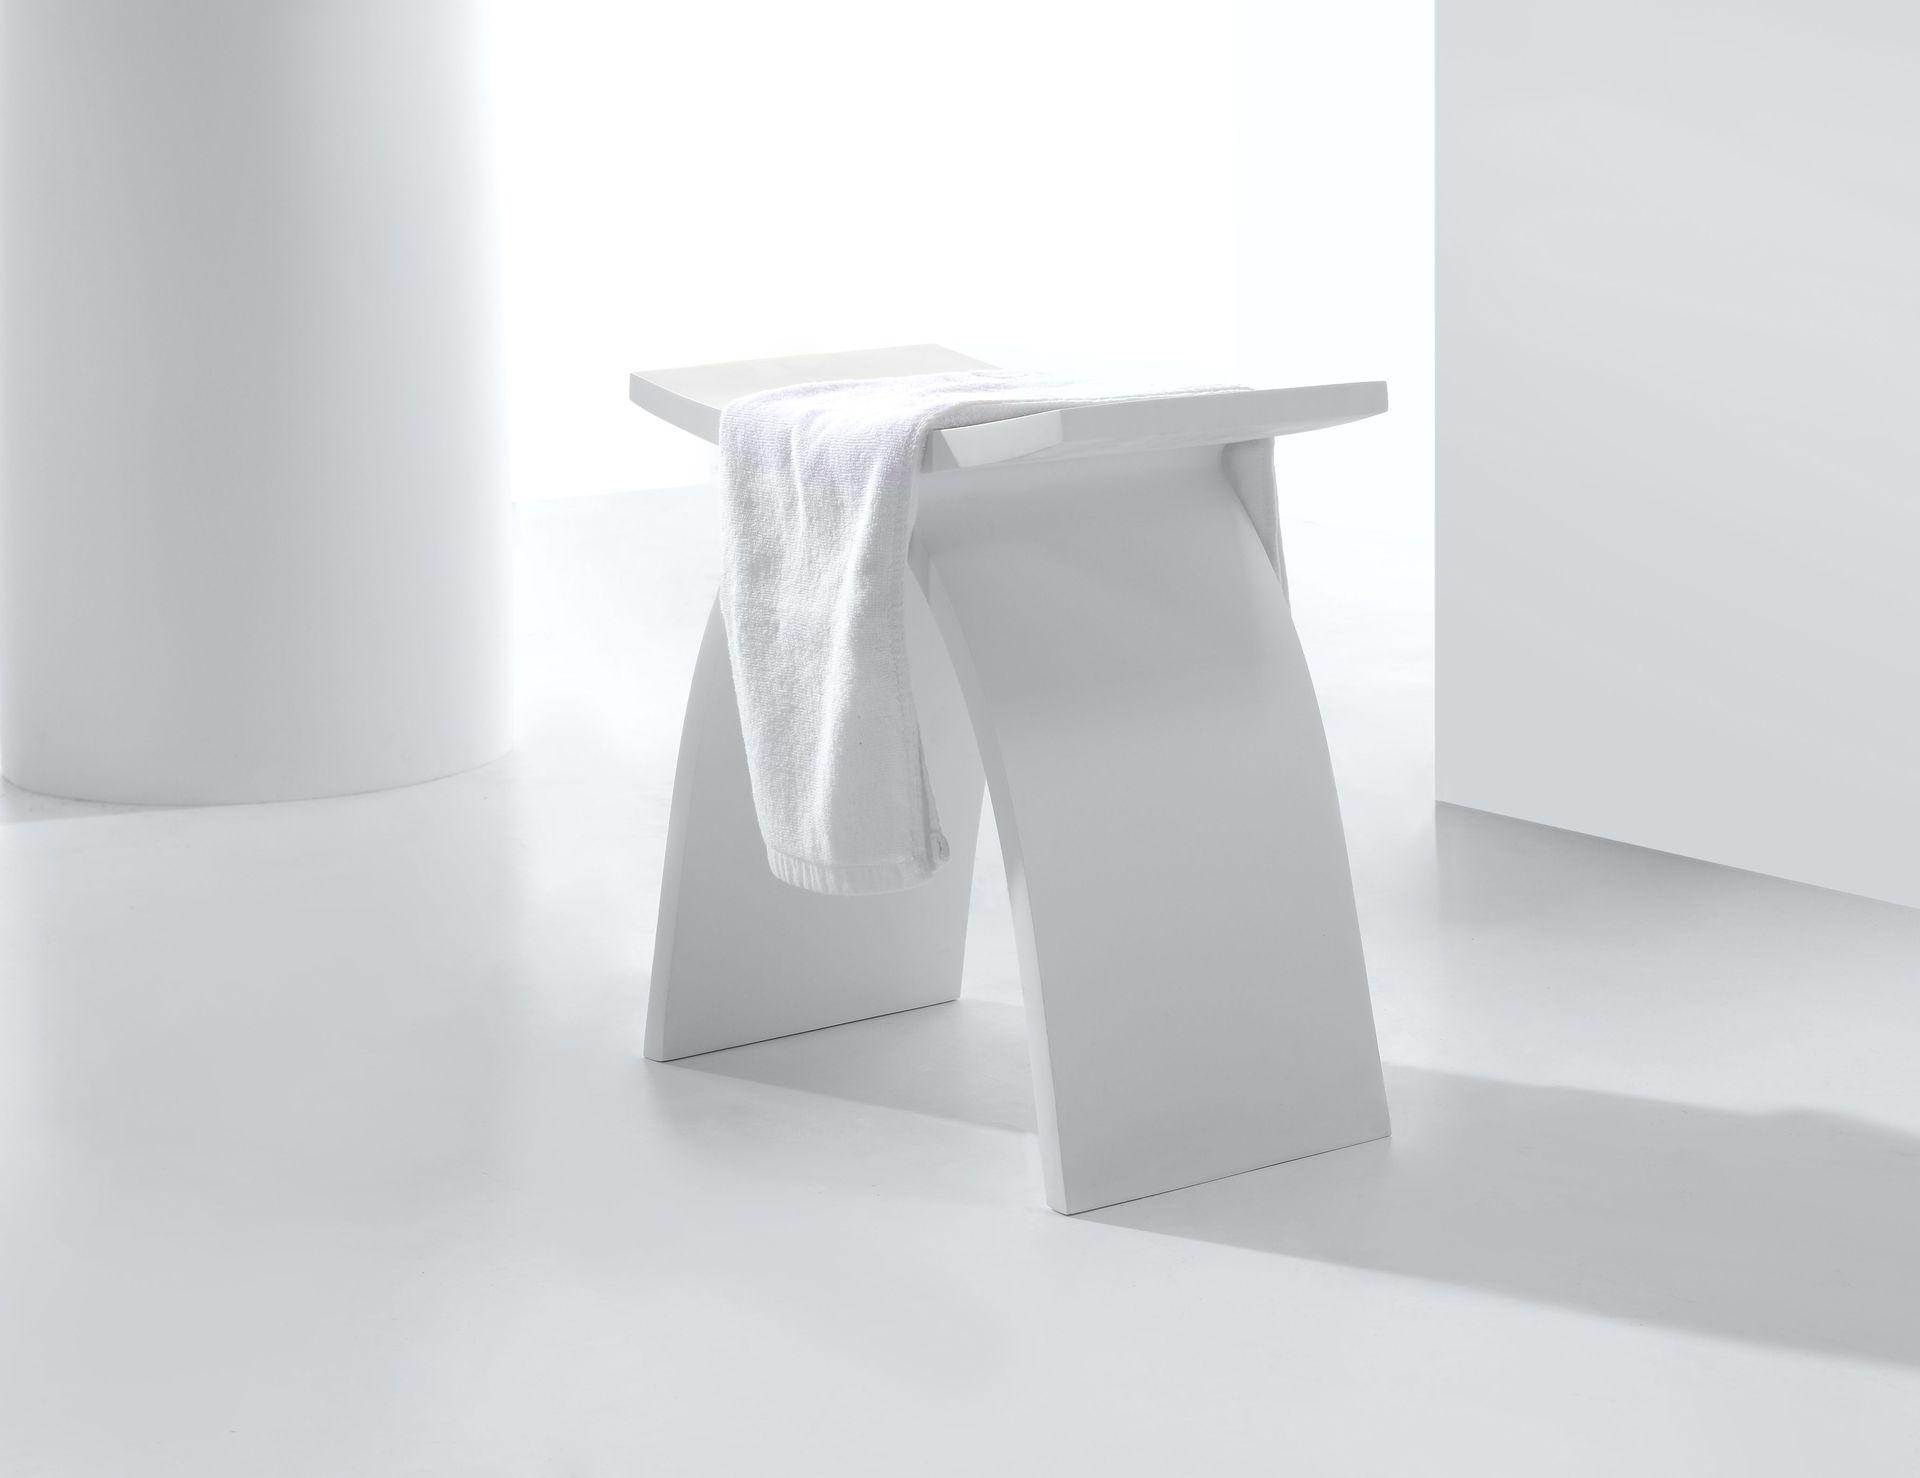 Solid Surface Hocker design in uw badkamer - Douchecabine.nl